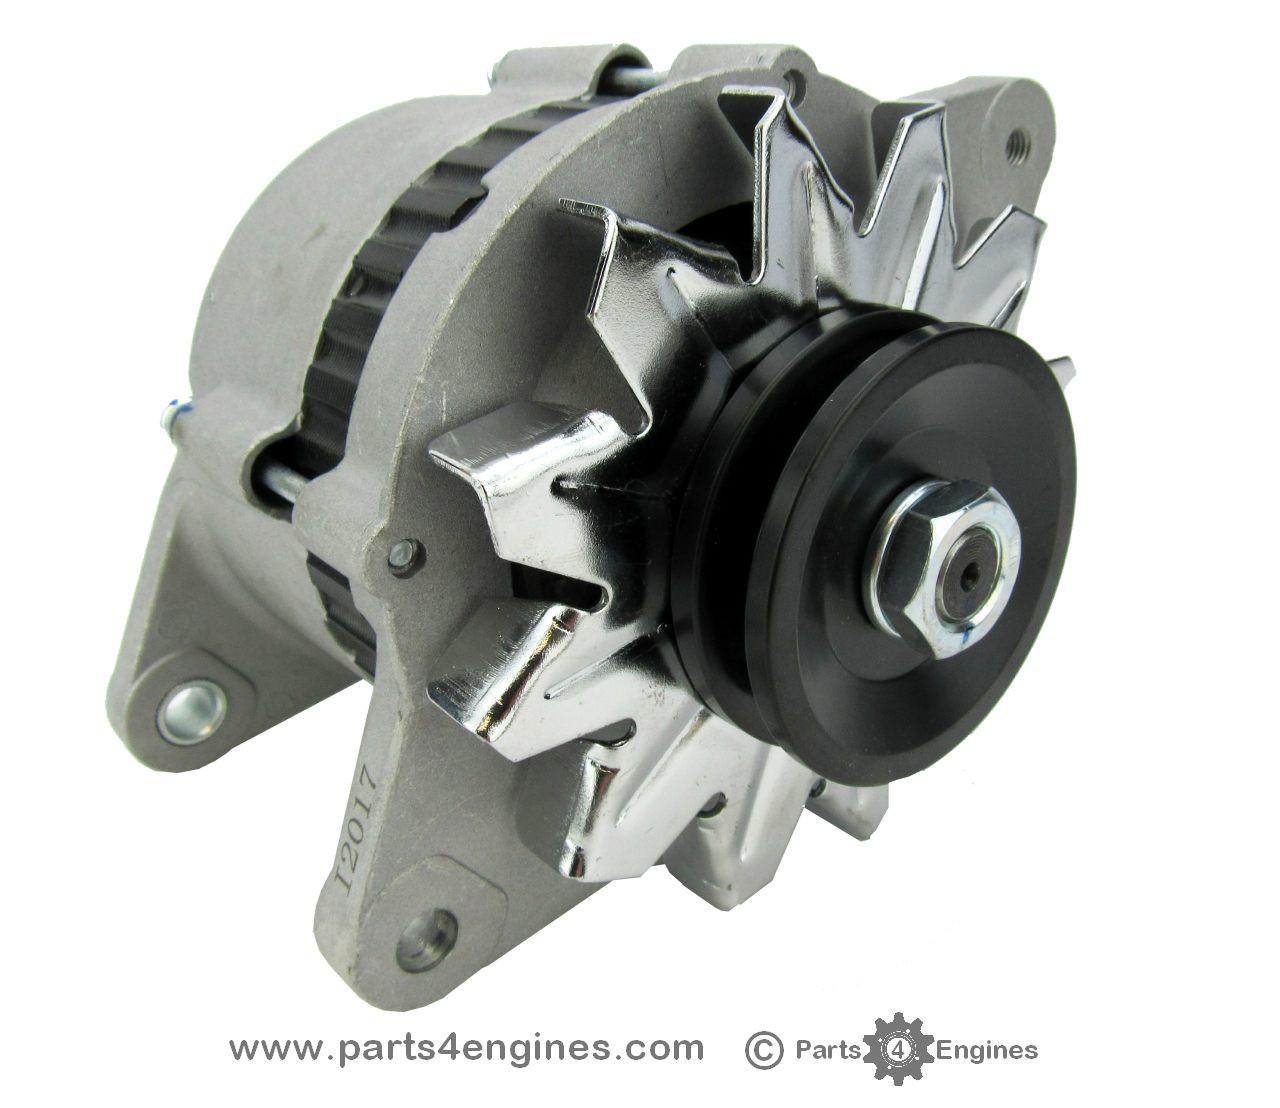 Yanmar 3gm30 Specification - yanmar spare parts yanmar 2gm20 3gm30